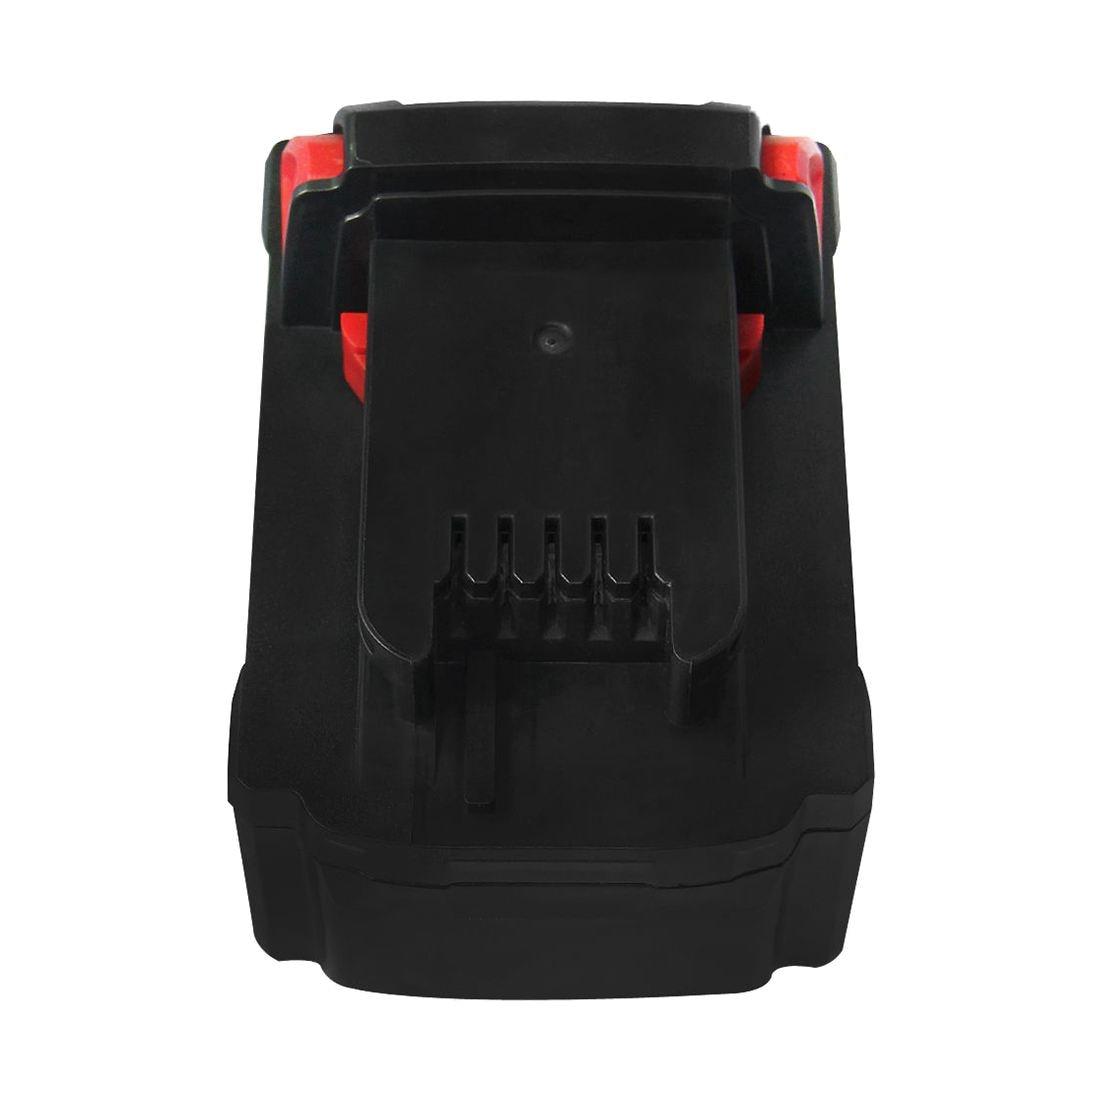 2pcs for Milwaukee 48-11-1828 M18 XC LITHIUM Li-ion Fuel Battery Pack 4.0Ah 18V 2 x panku 18v lithium 4000mah replacement rechargeable power tool battery for milwaukee m18 xc 48 11 1815 m18b2 m18b4 m18bx